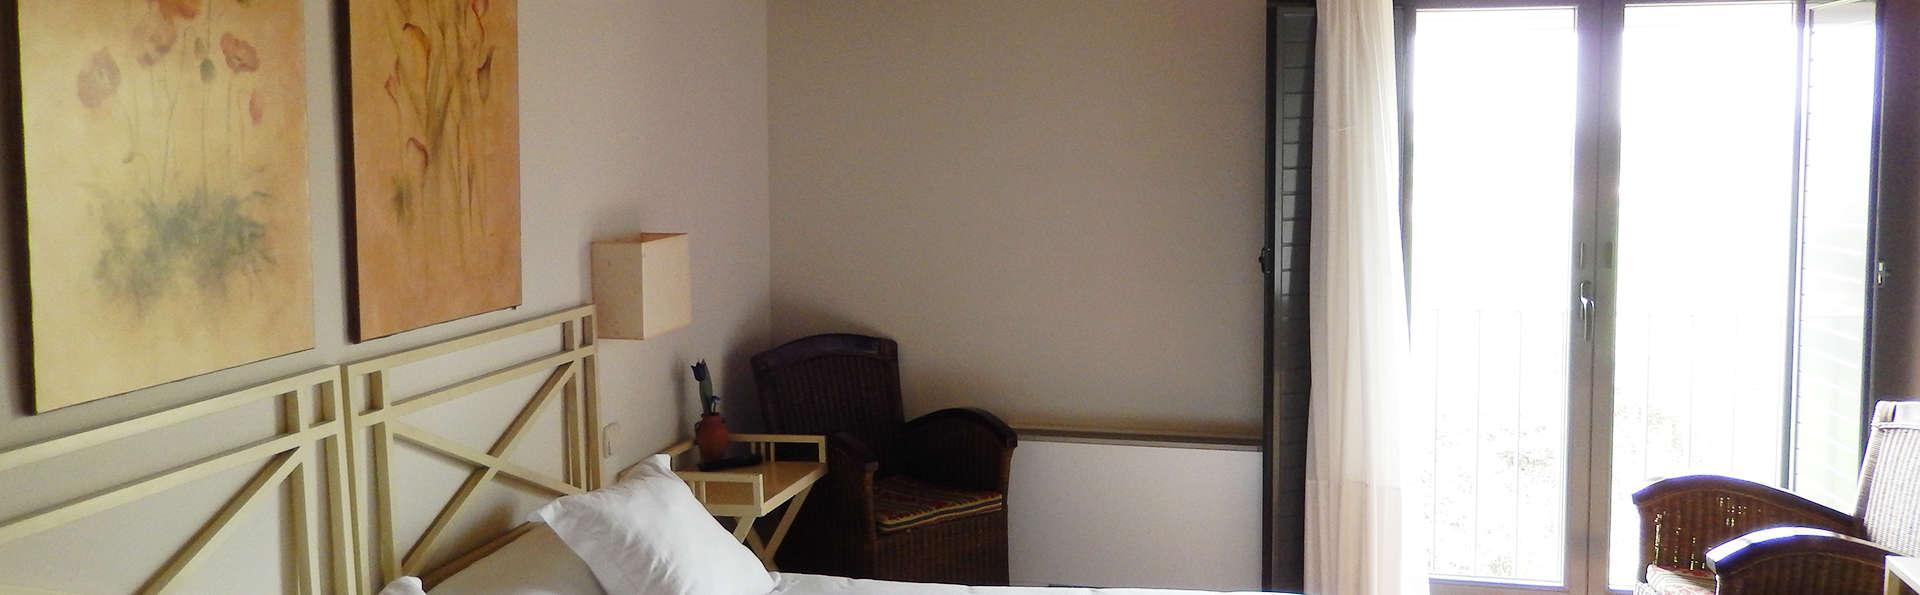 Hotel El Turcal - EDIT_room10.jpg